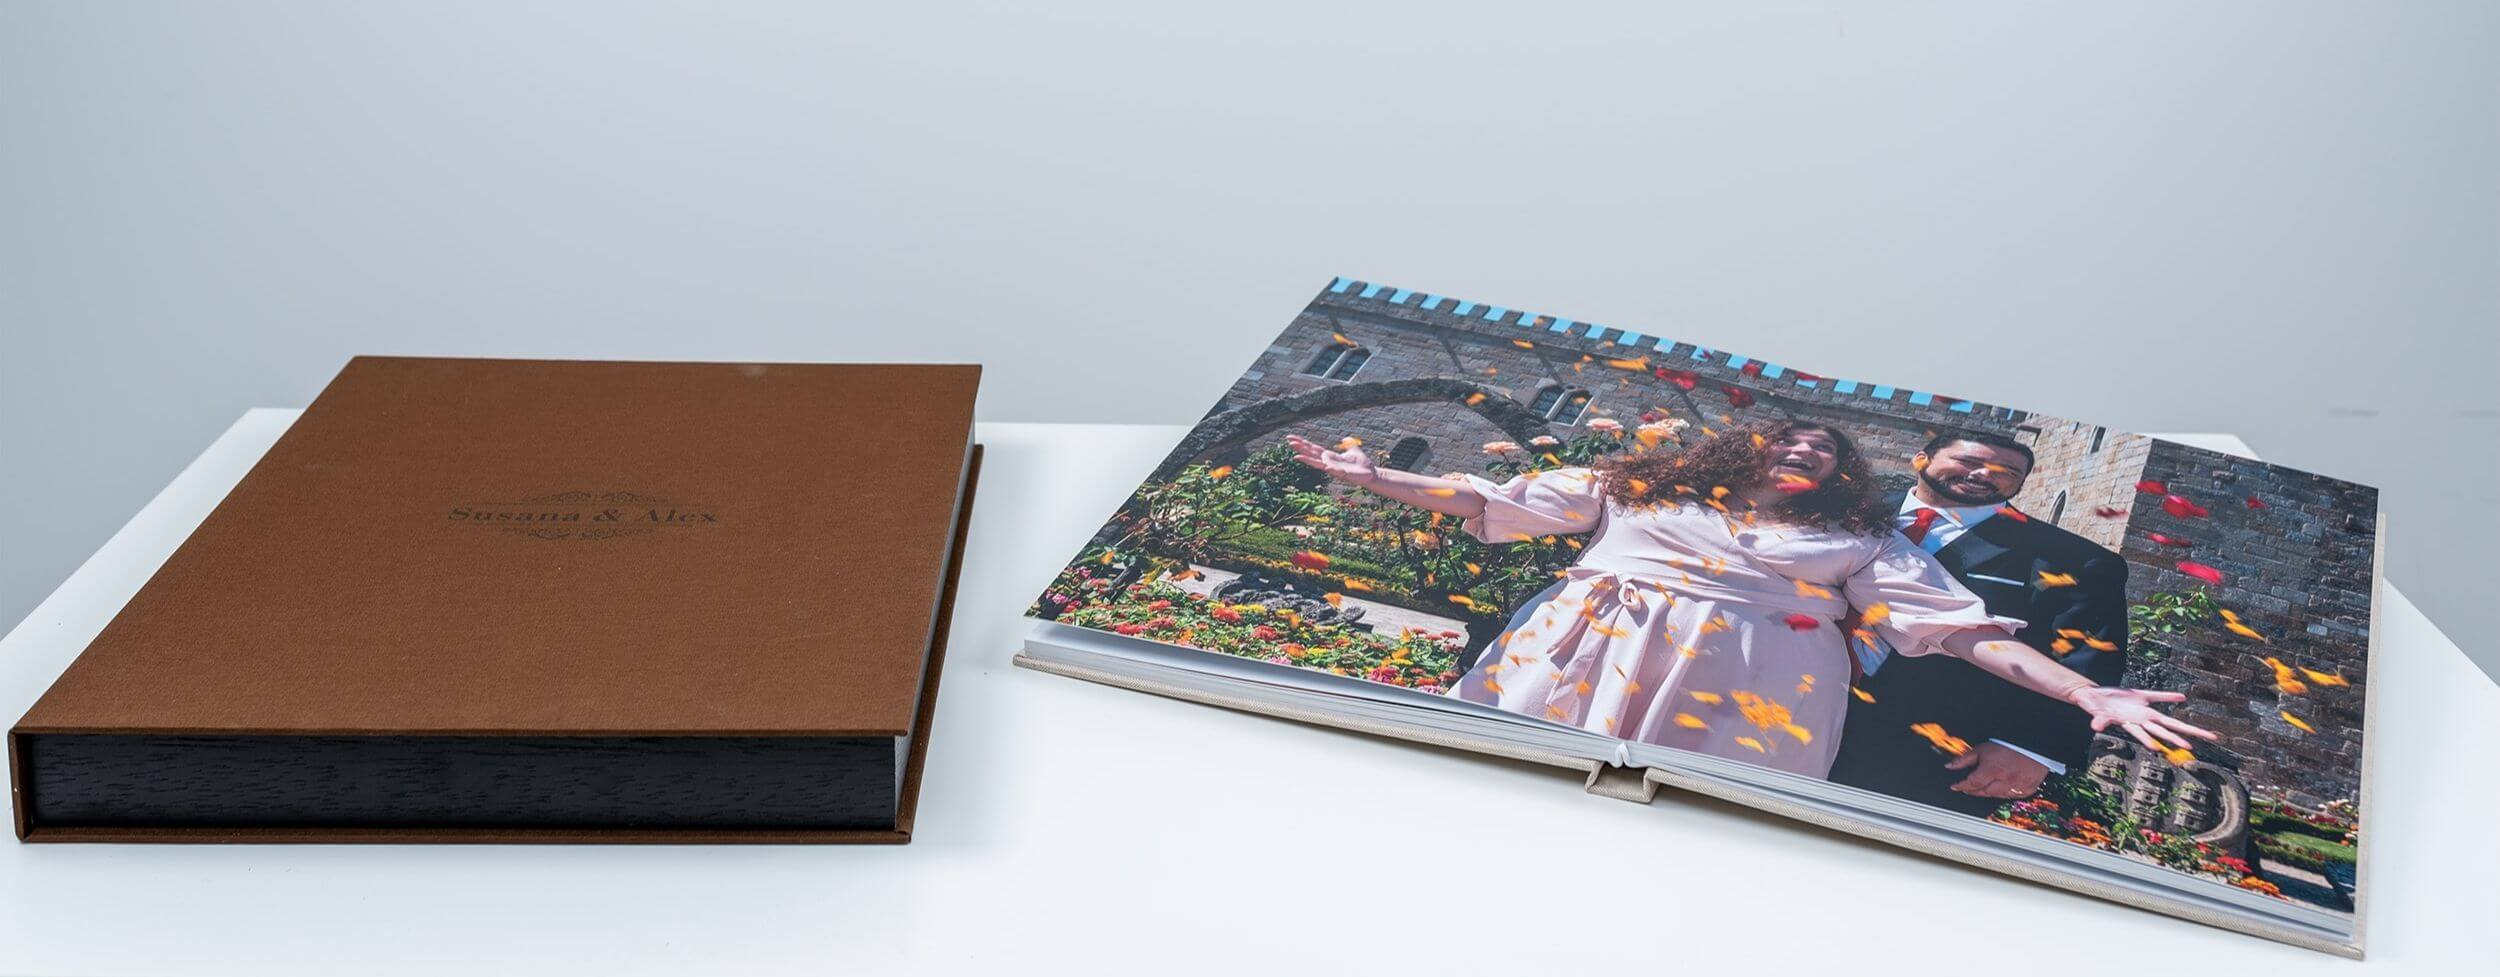 album-linen-box